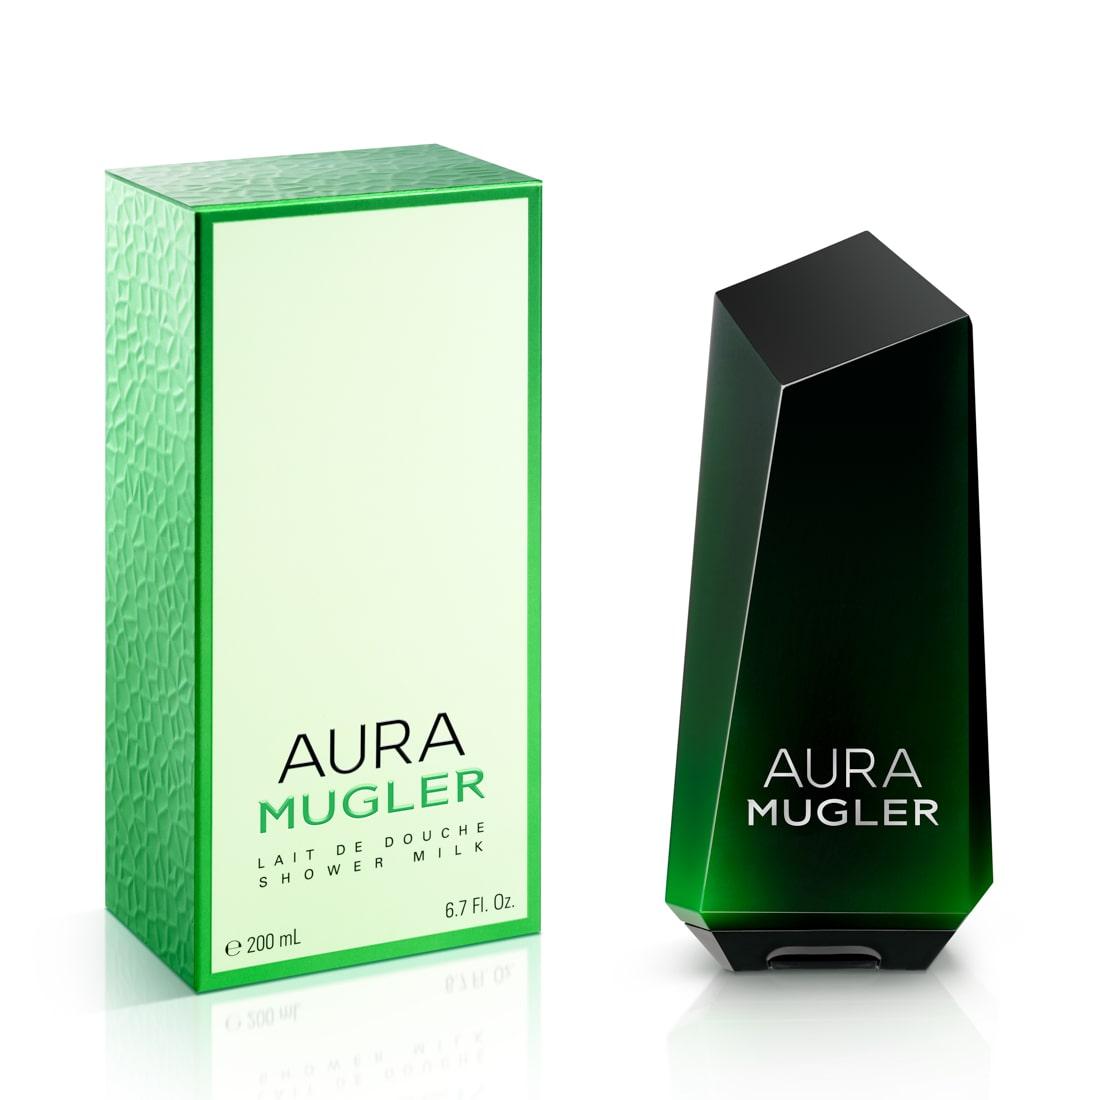 Aura Mugler Shower Milk 200ml